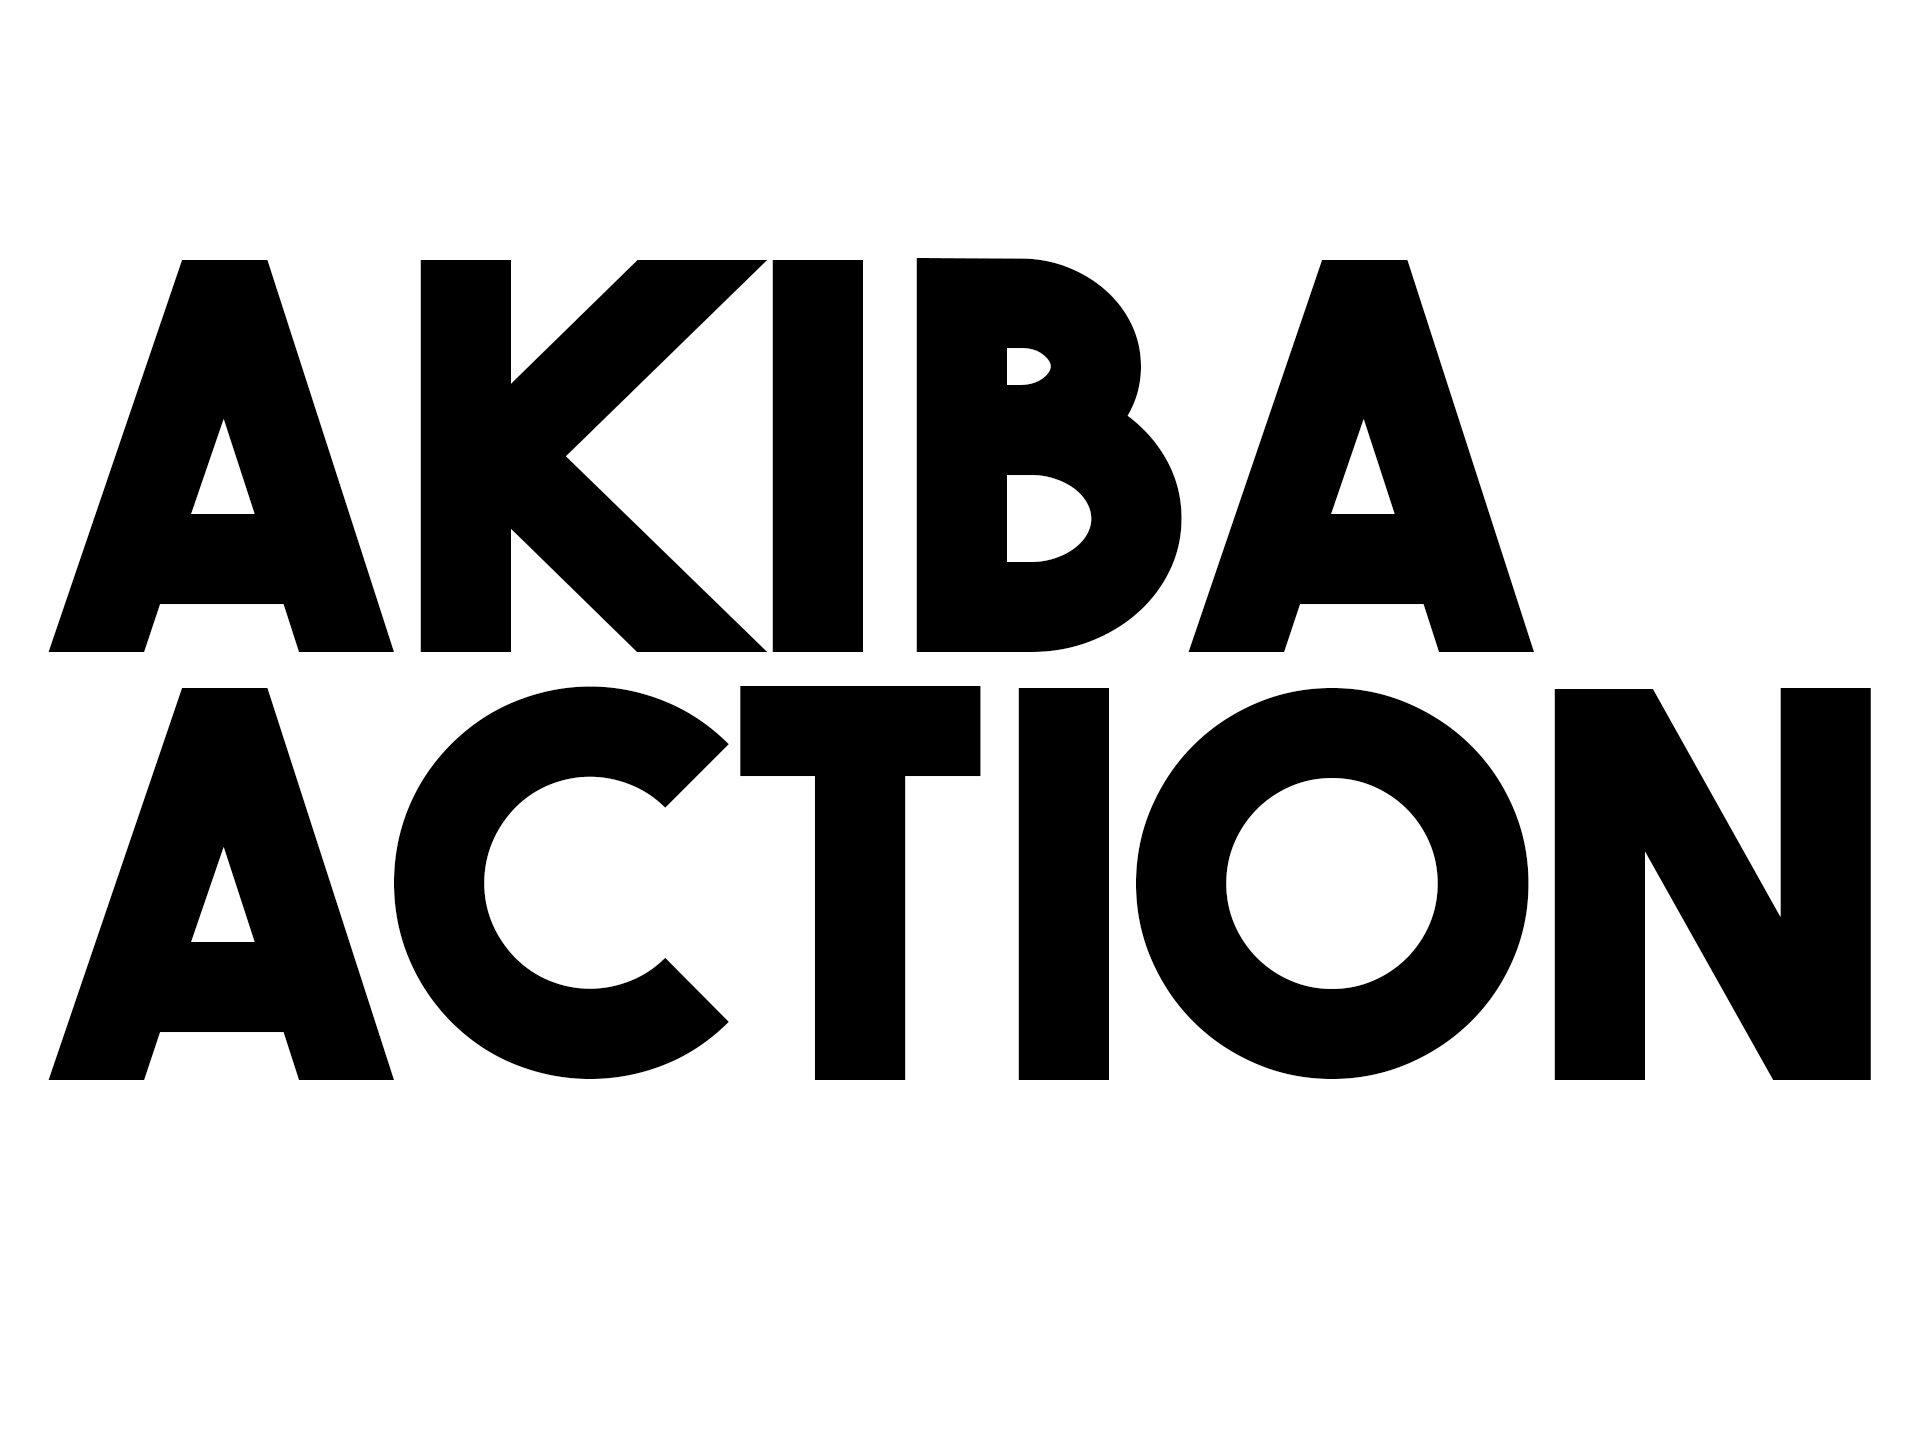 AKIBA ACTION